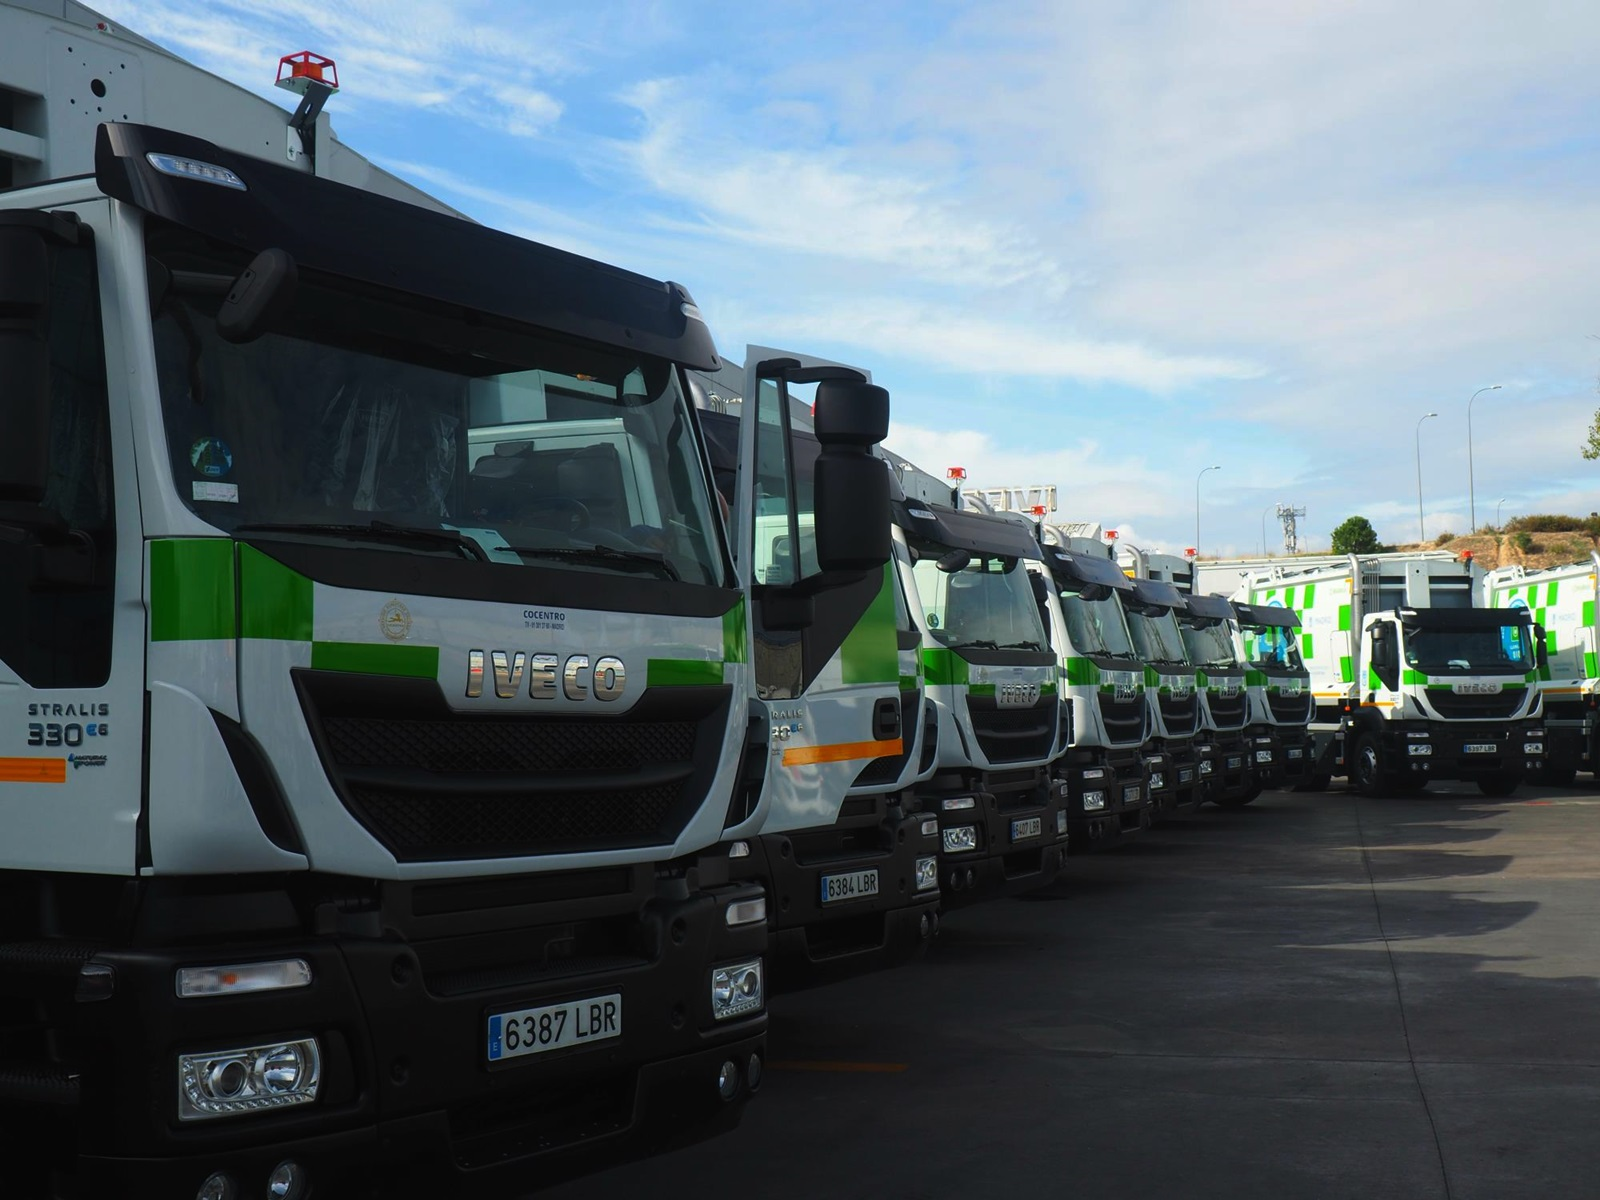 Camiones Iveco De Gnc (1)